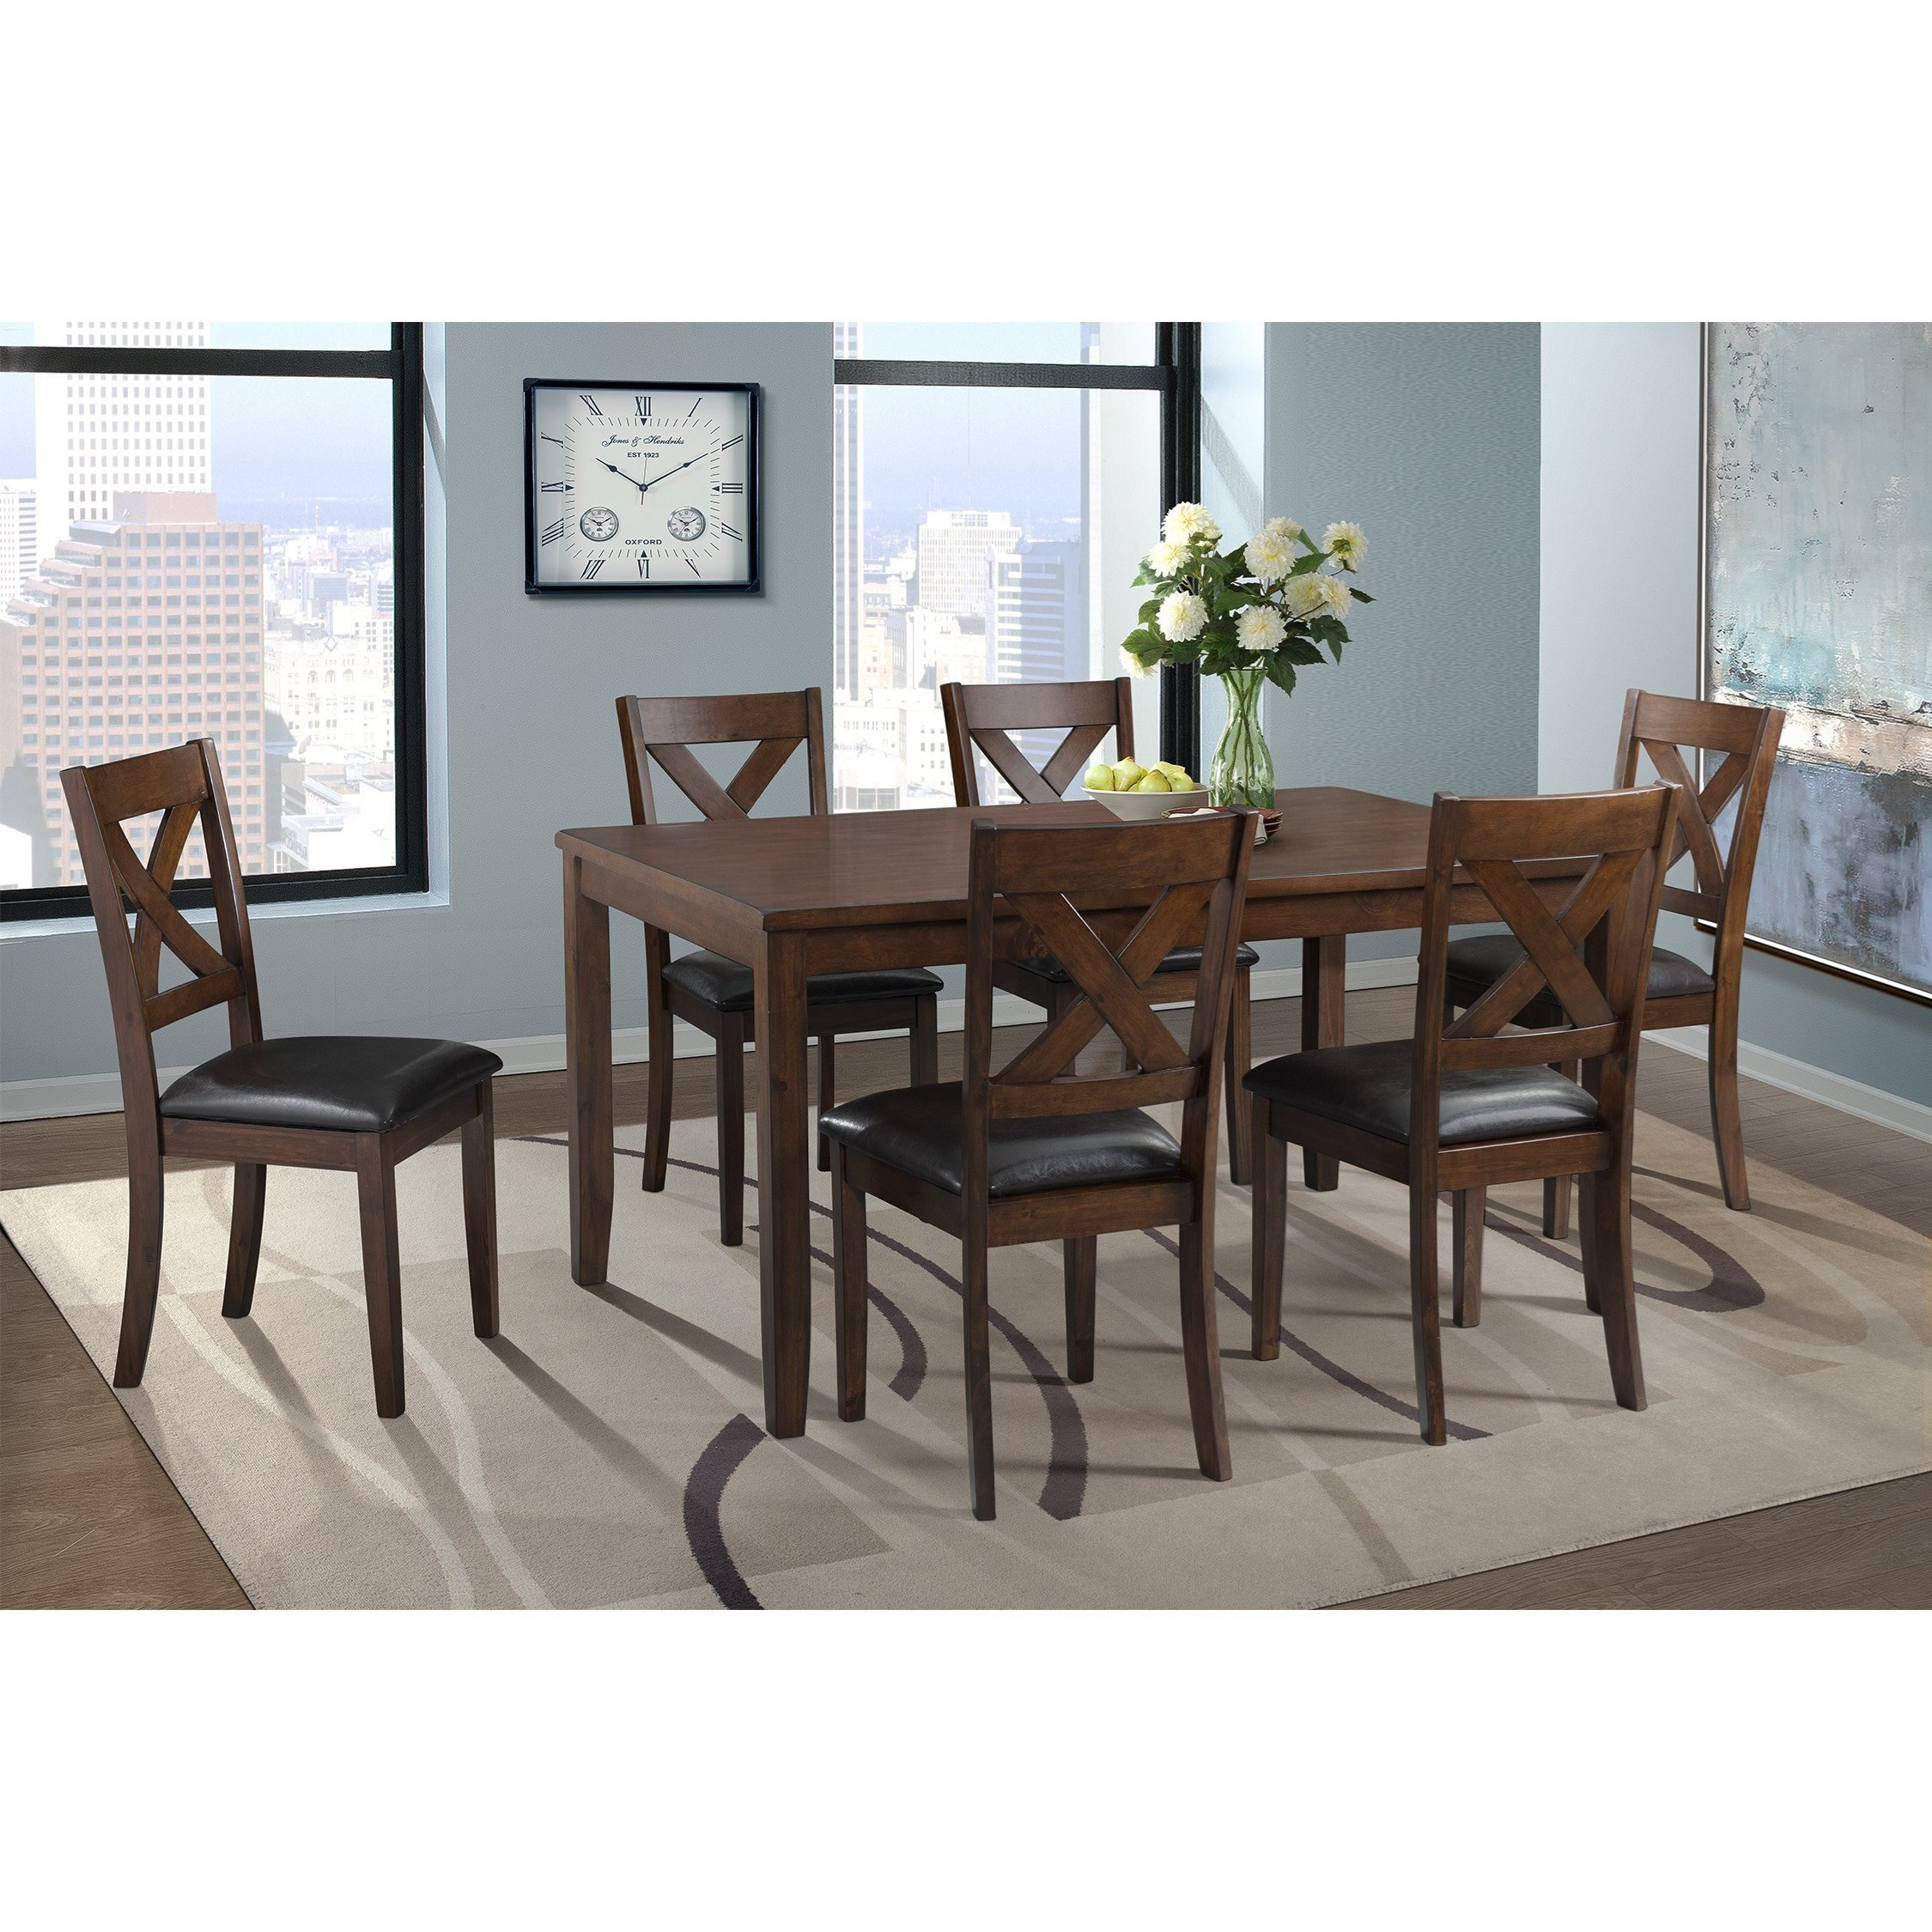 Alex 7-Piece Dining Set by Elements International at Becker Furniture